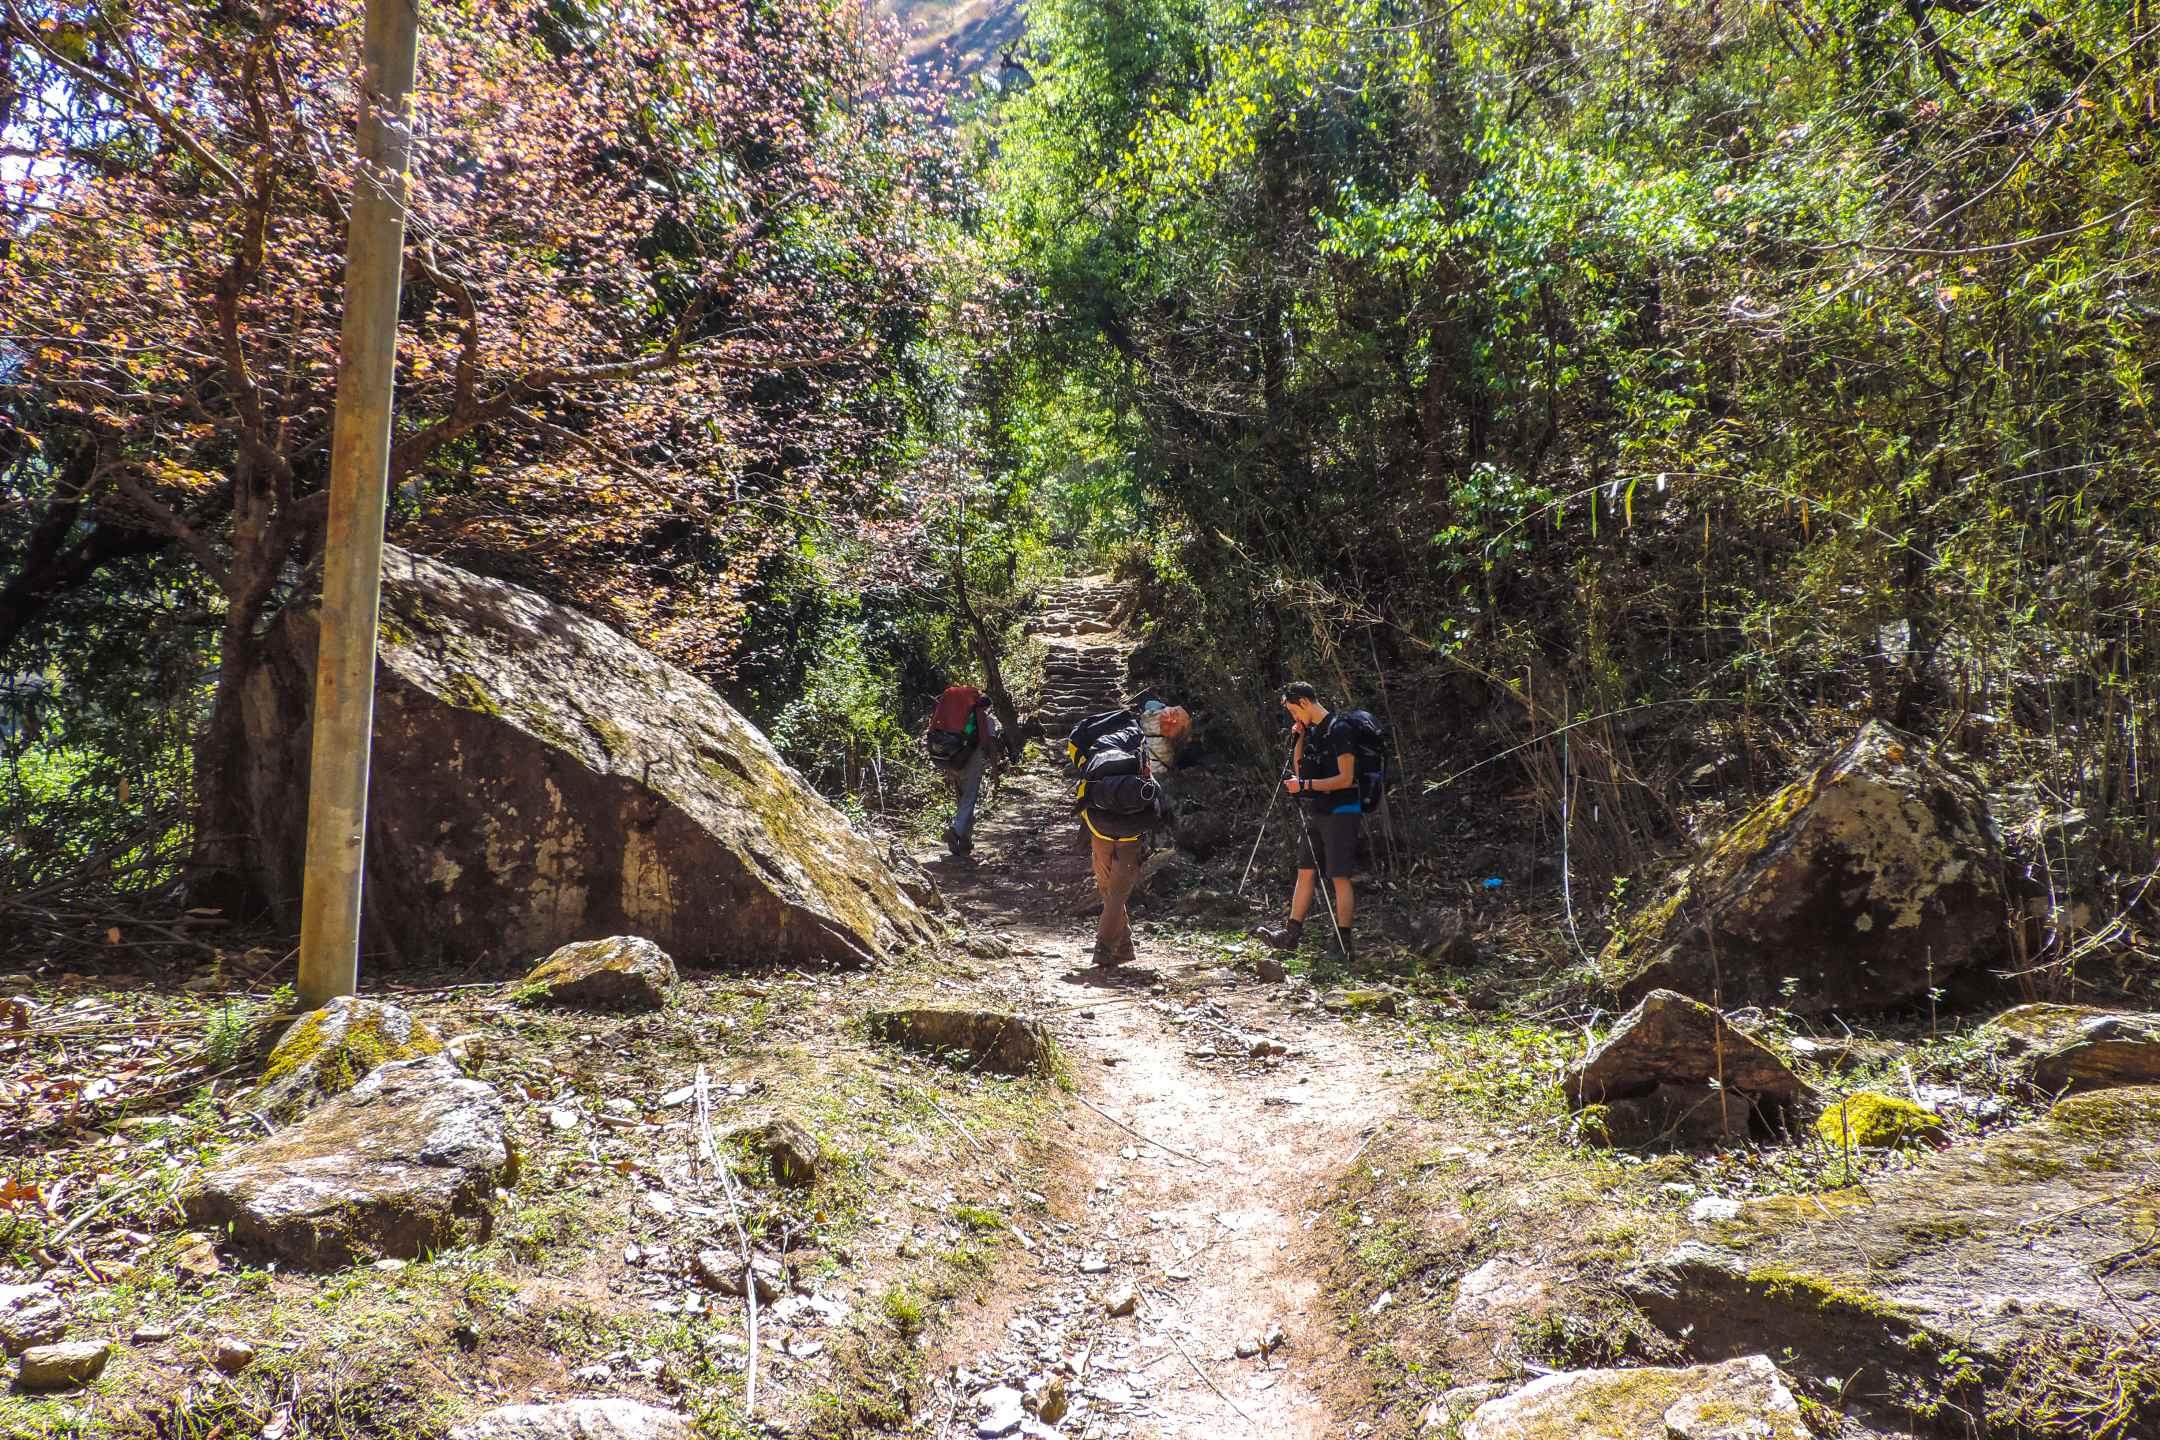 Trekkers on the Tamang trail